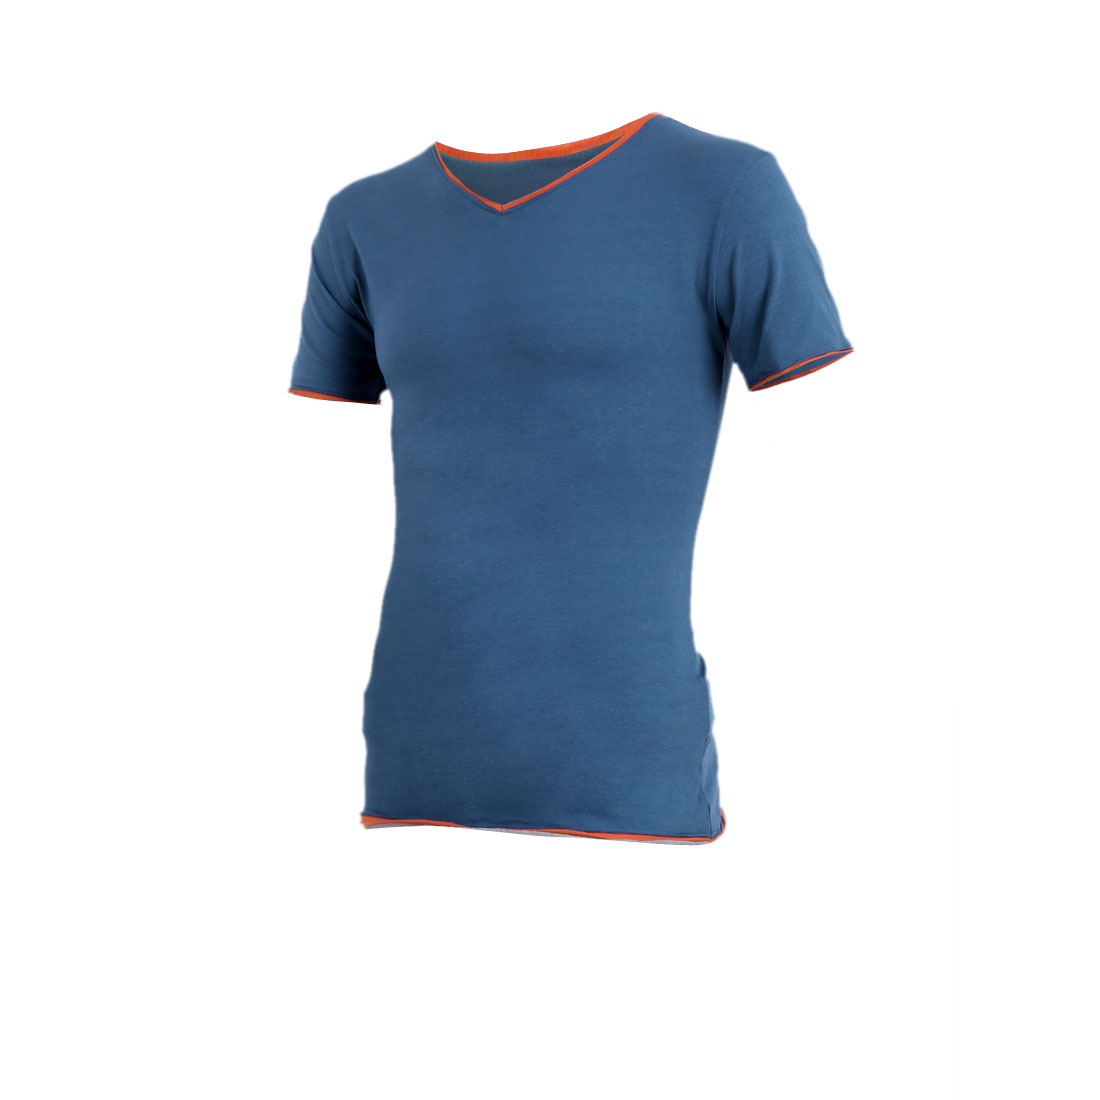 Men Stylish Pullover Elastic Splice Detail Indigo Blue Tee Shirt S